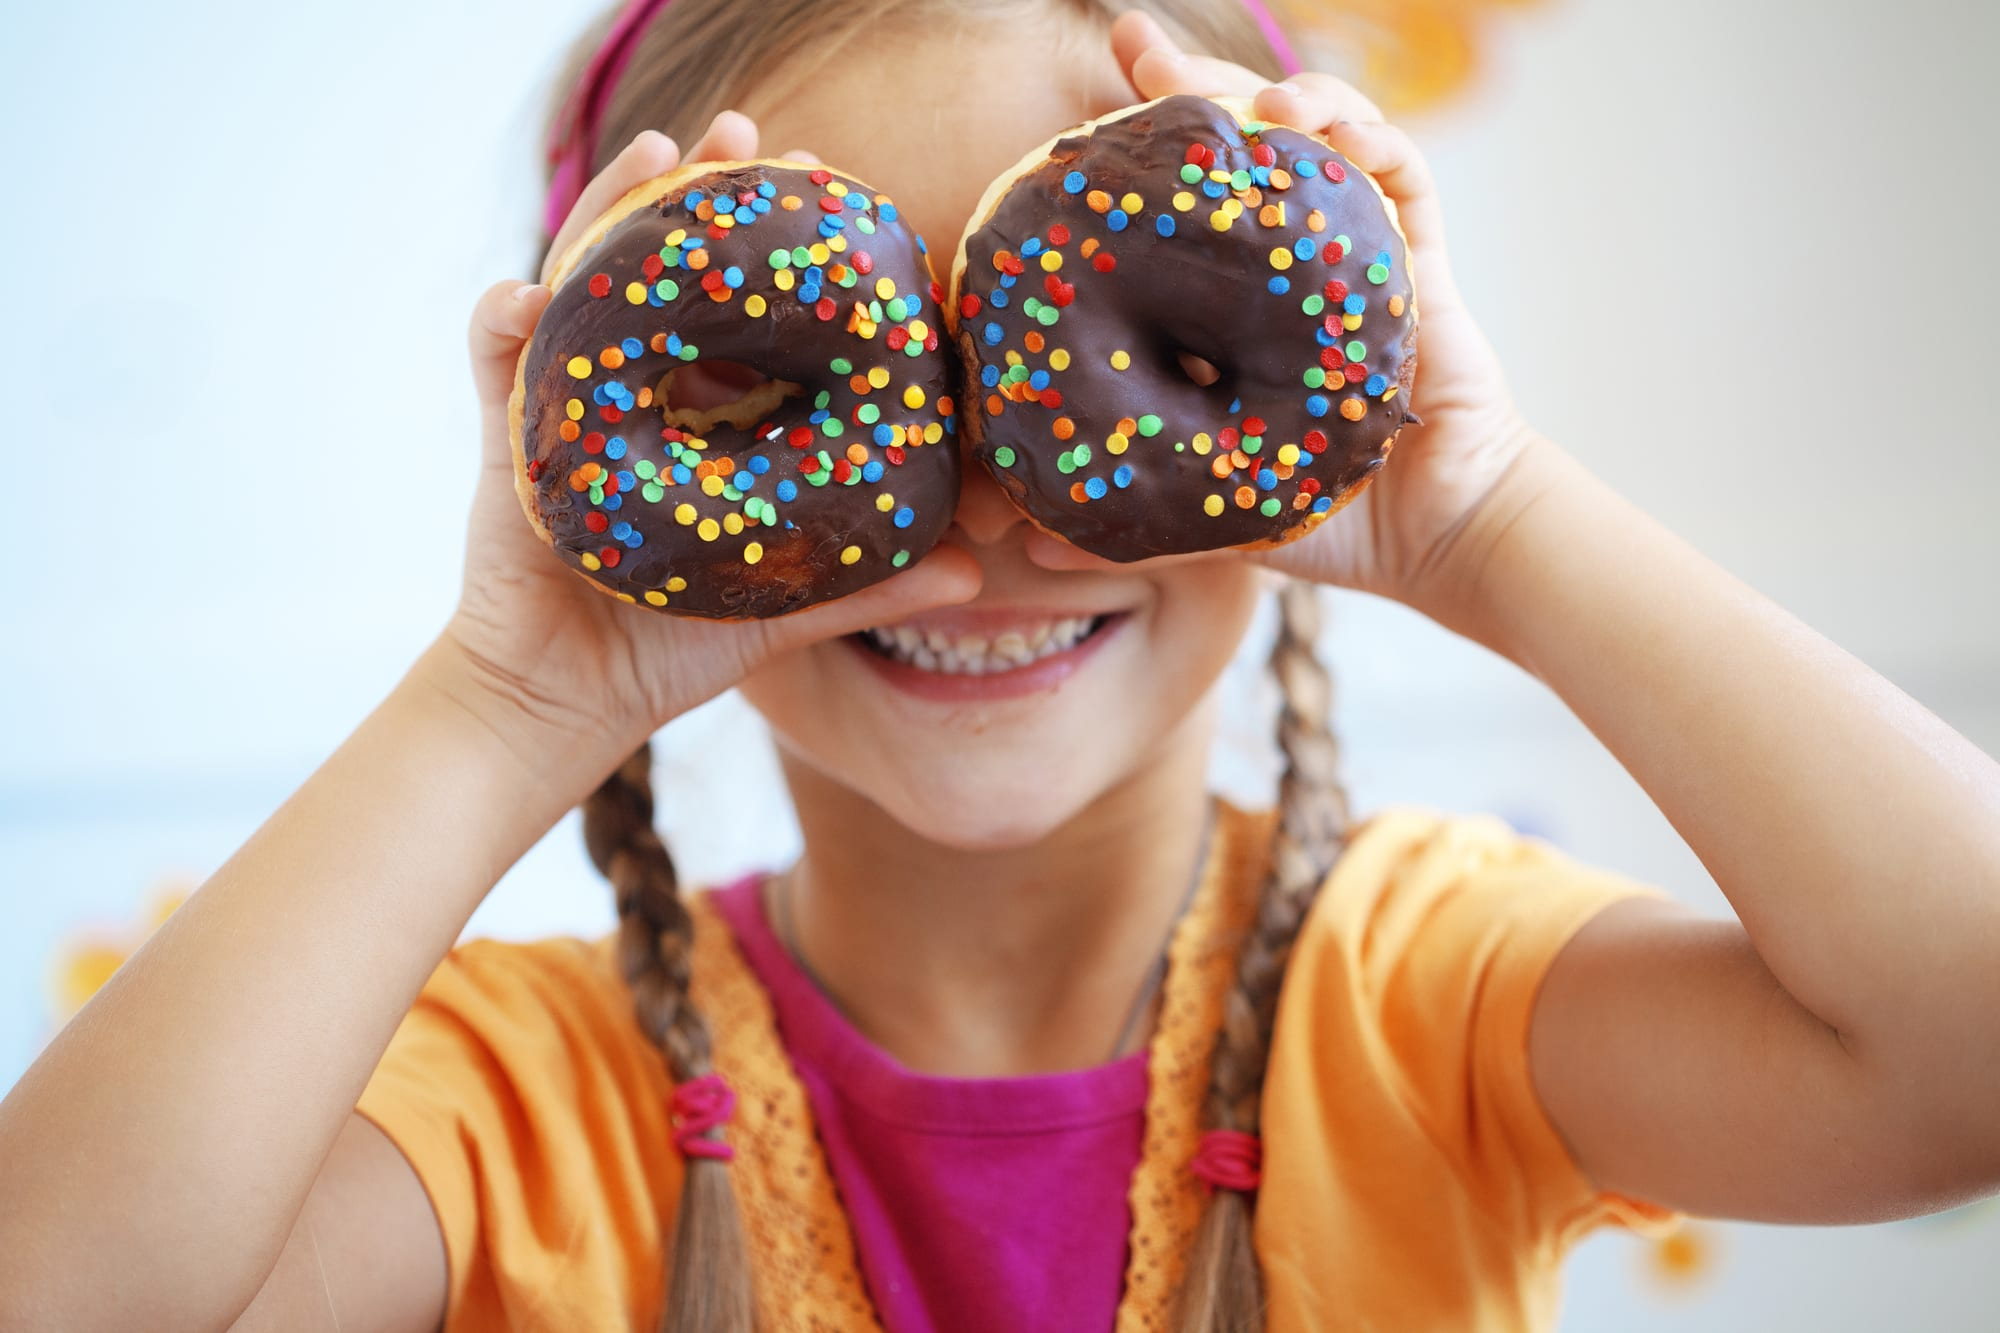 little girl holding donuts over her eyes